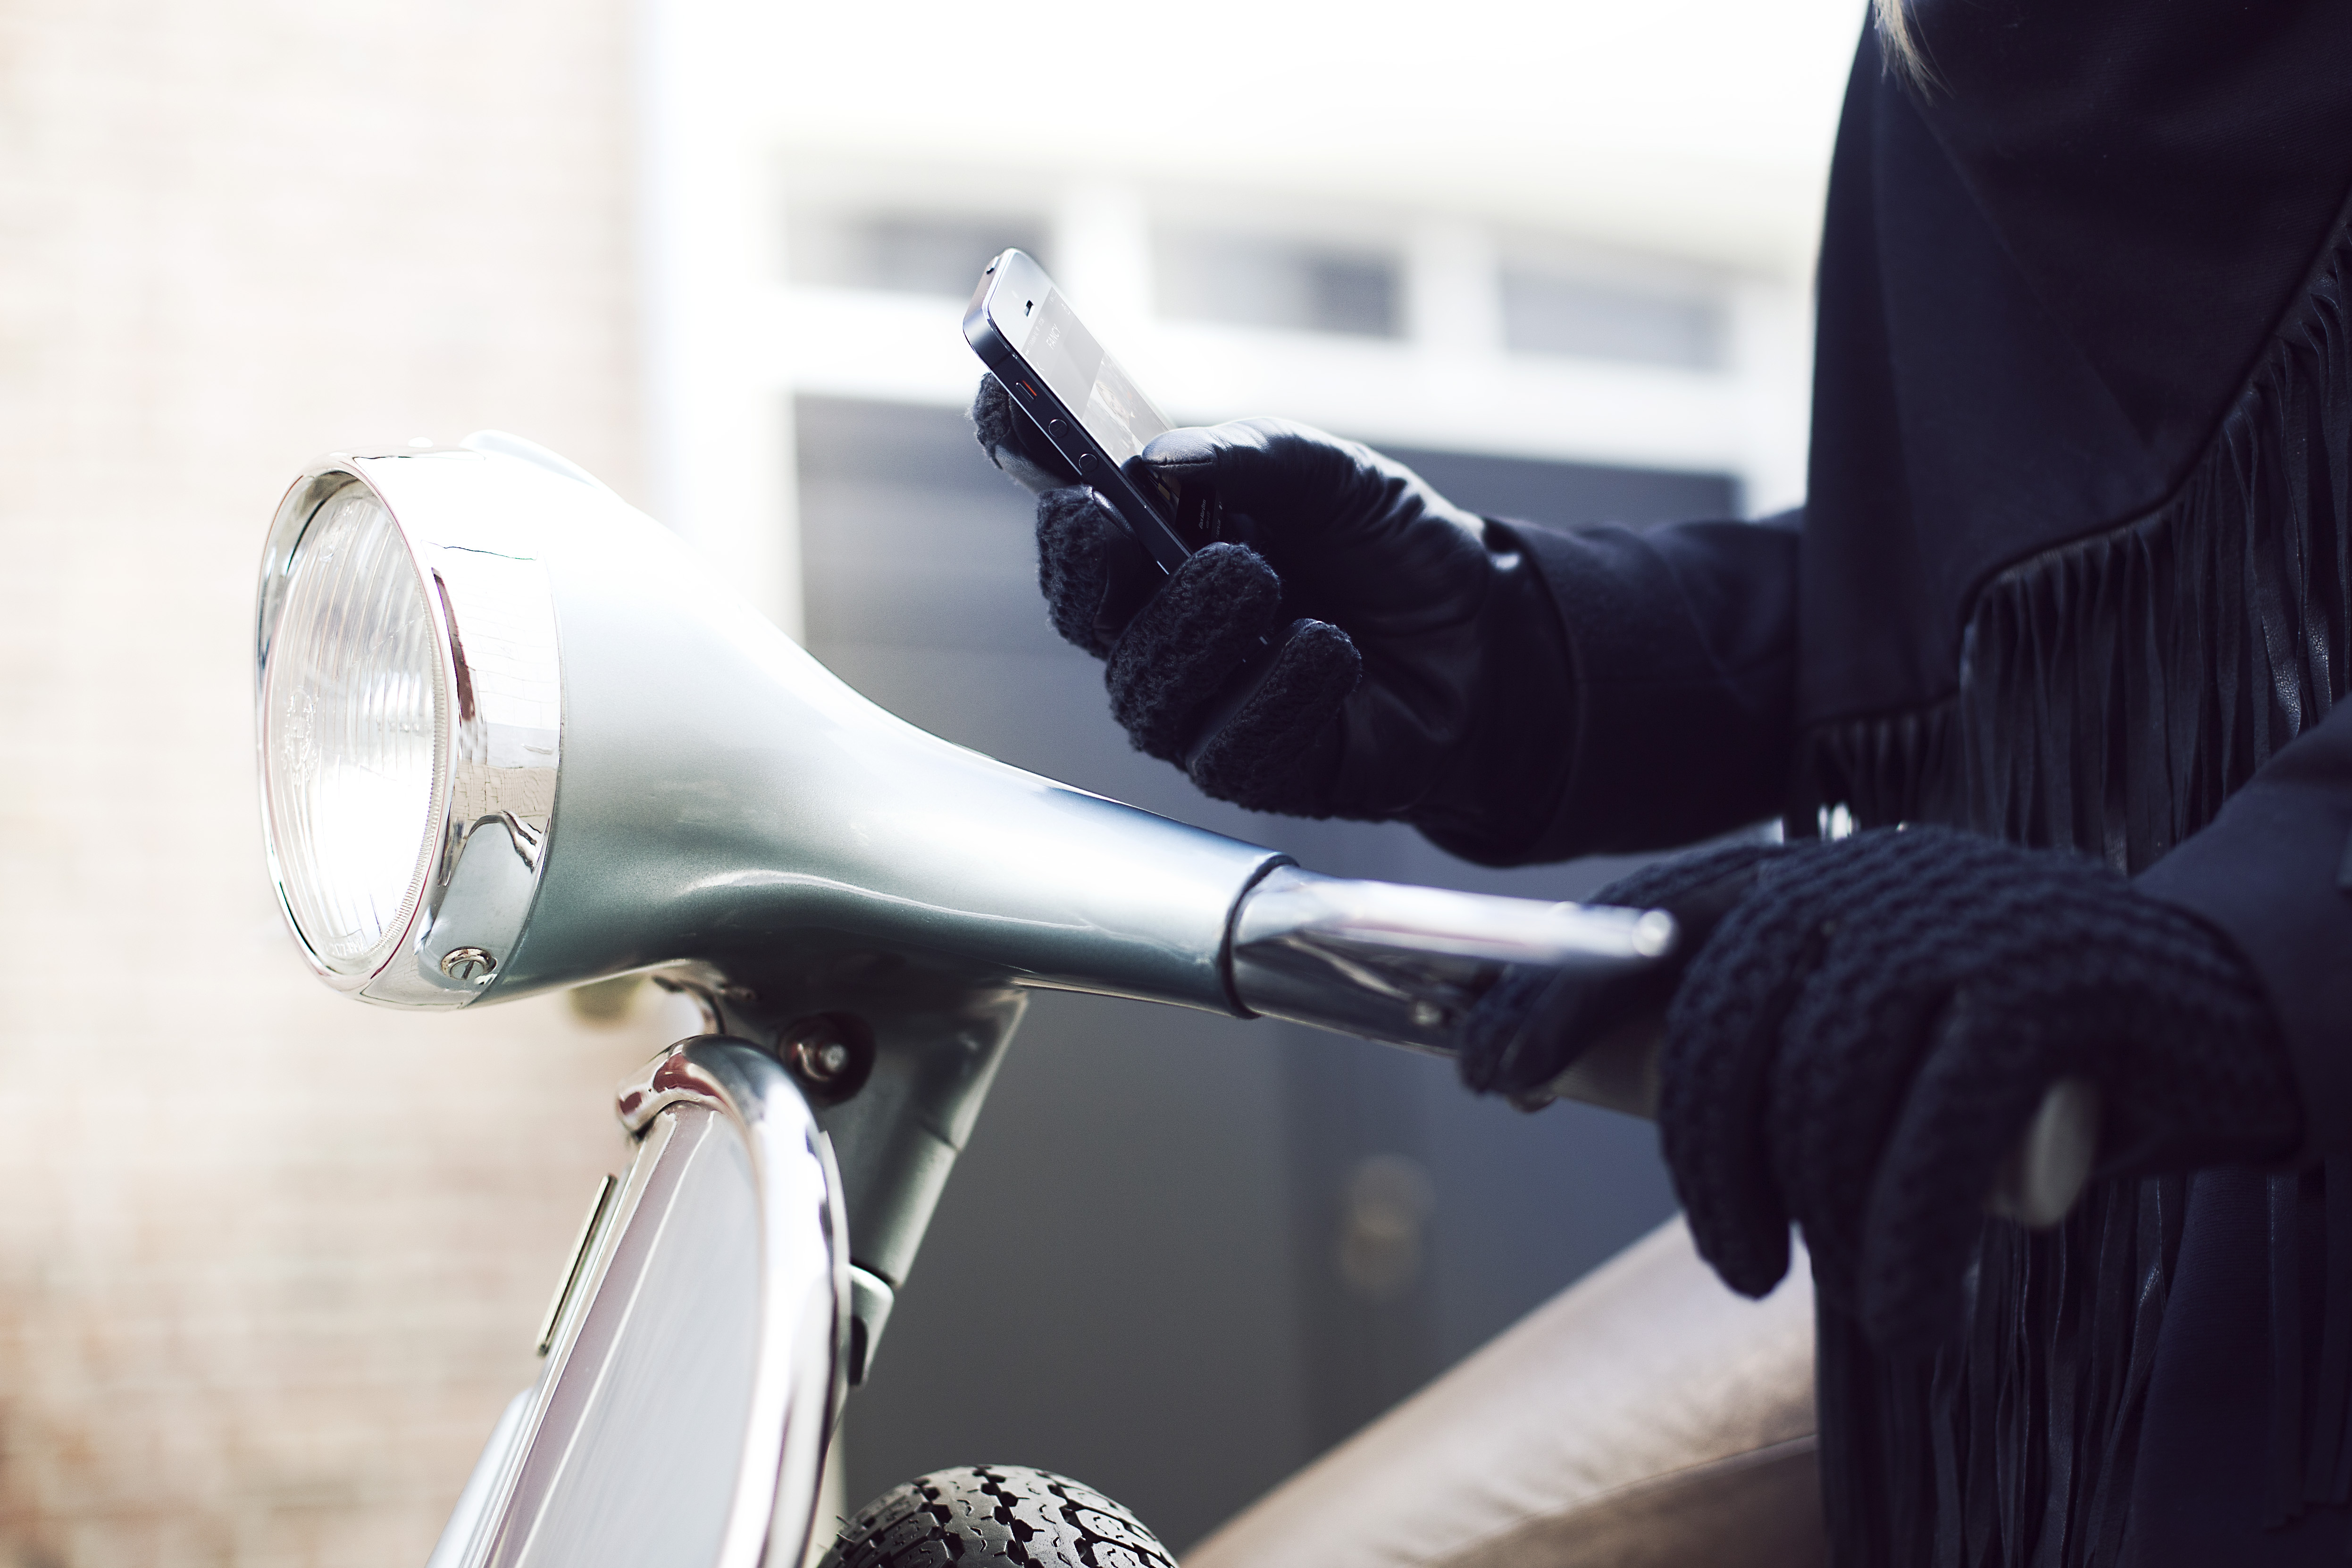 Womens leather smartphone gloves -  Leather Crochet Touchscreen Gloves For Women 001 Medium 1383591523 4985 X 3323